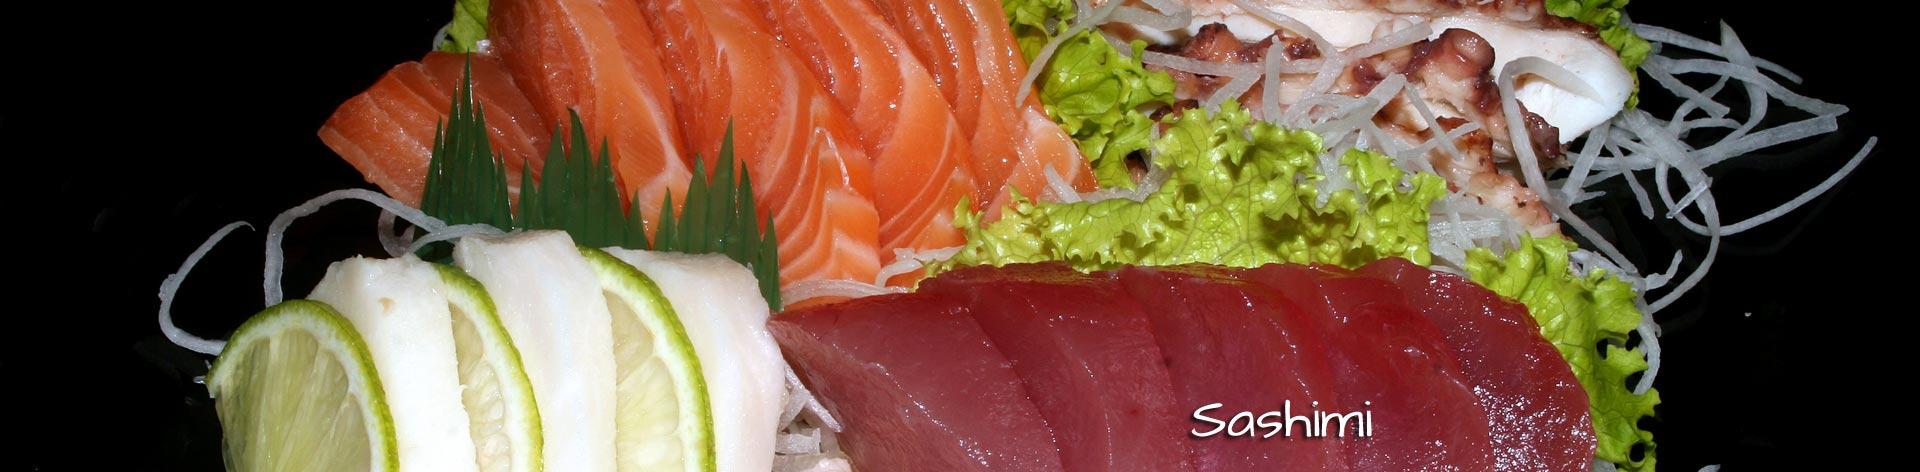 http://www.sushitakeda.com.br/wp-content/uploads/2011/07/sashimi.jpg